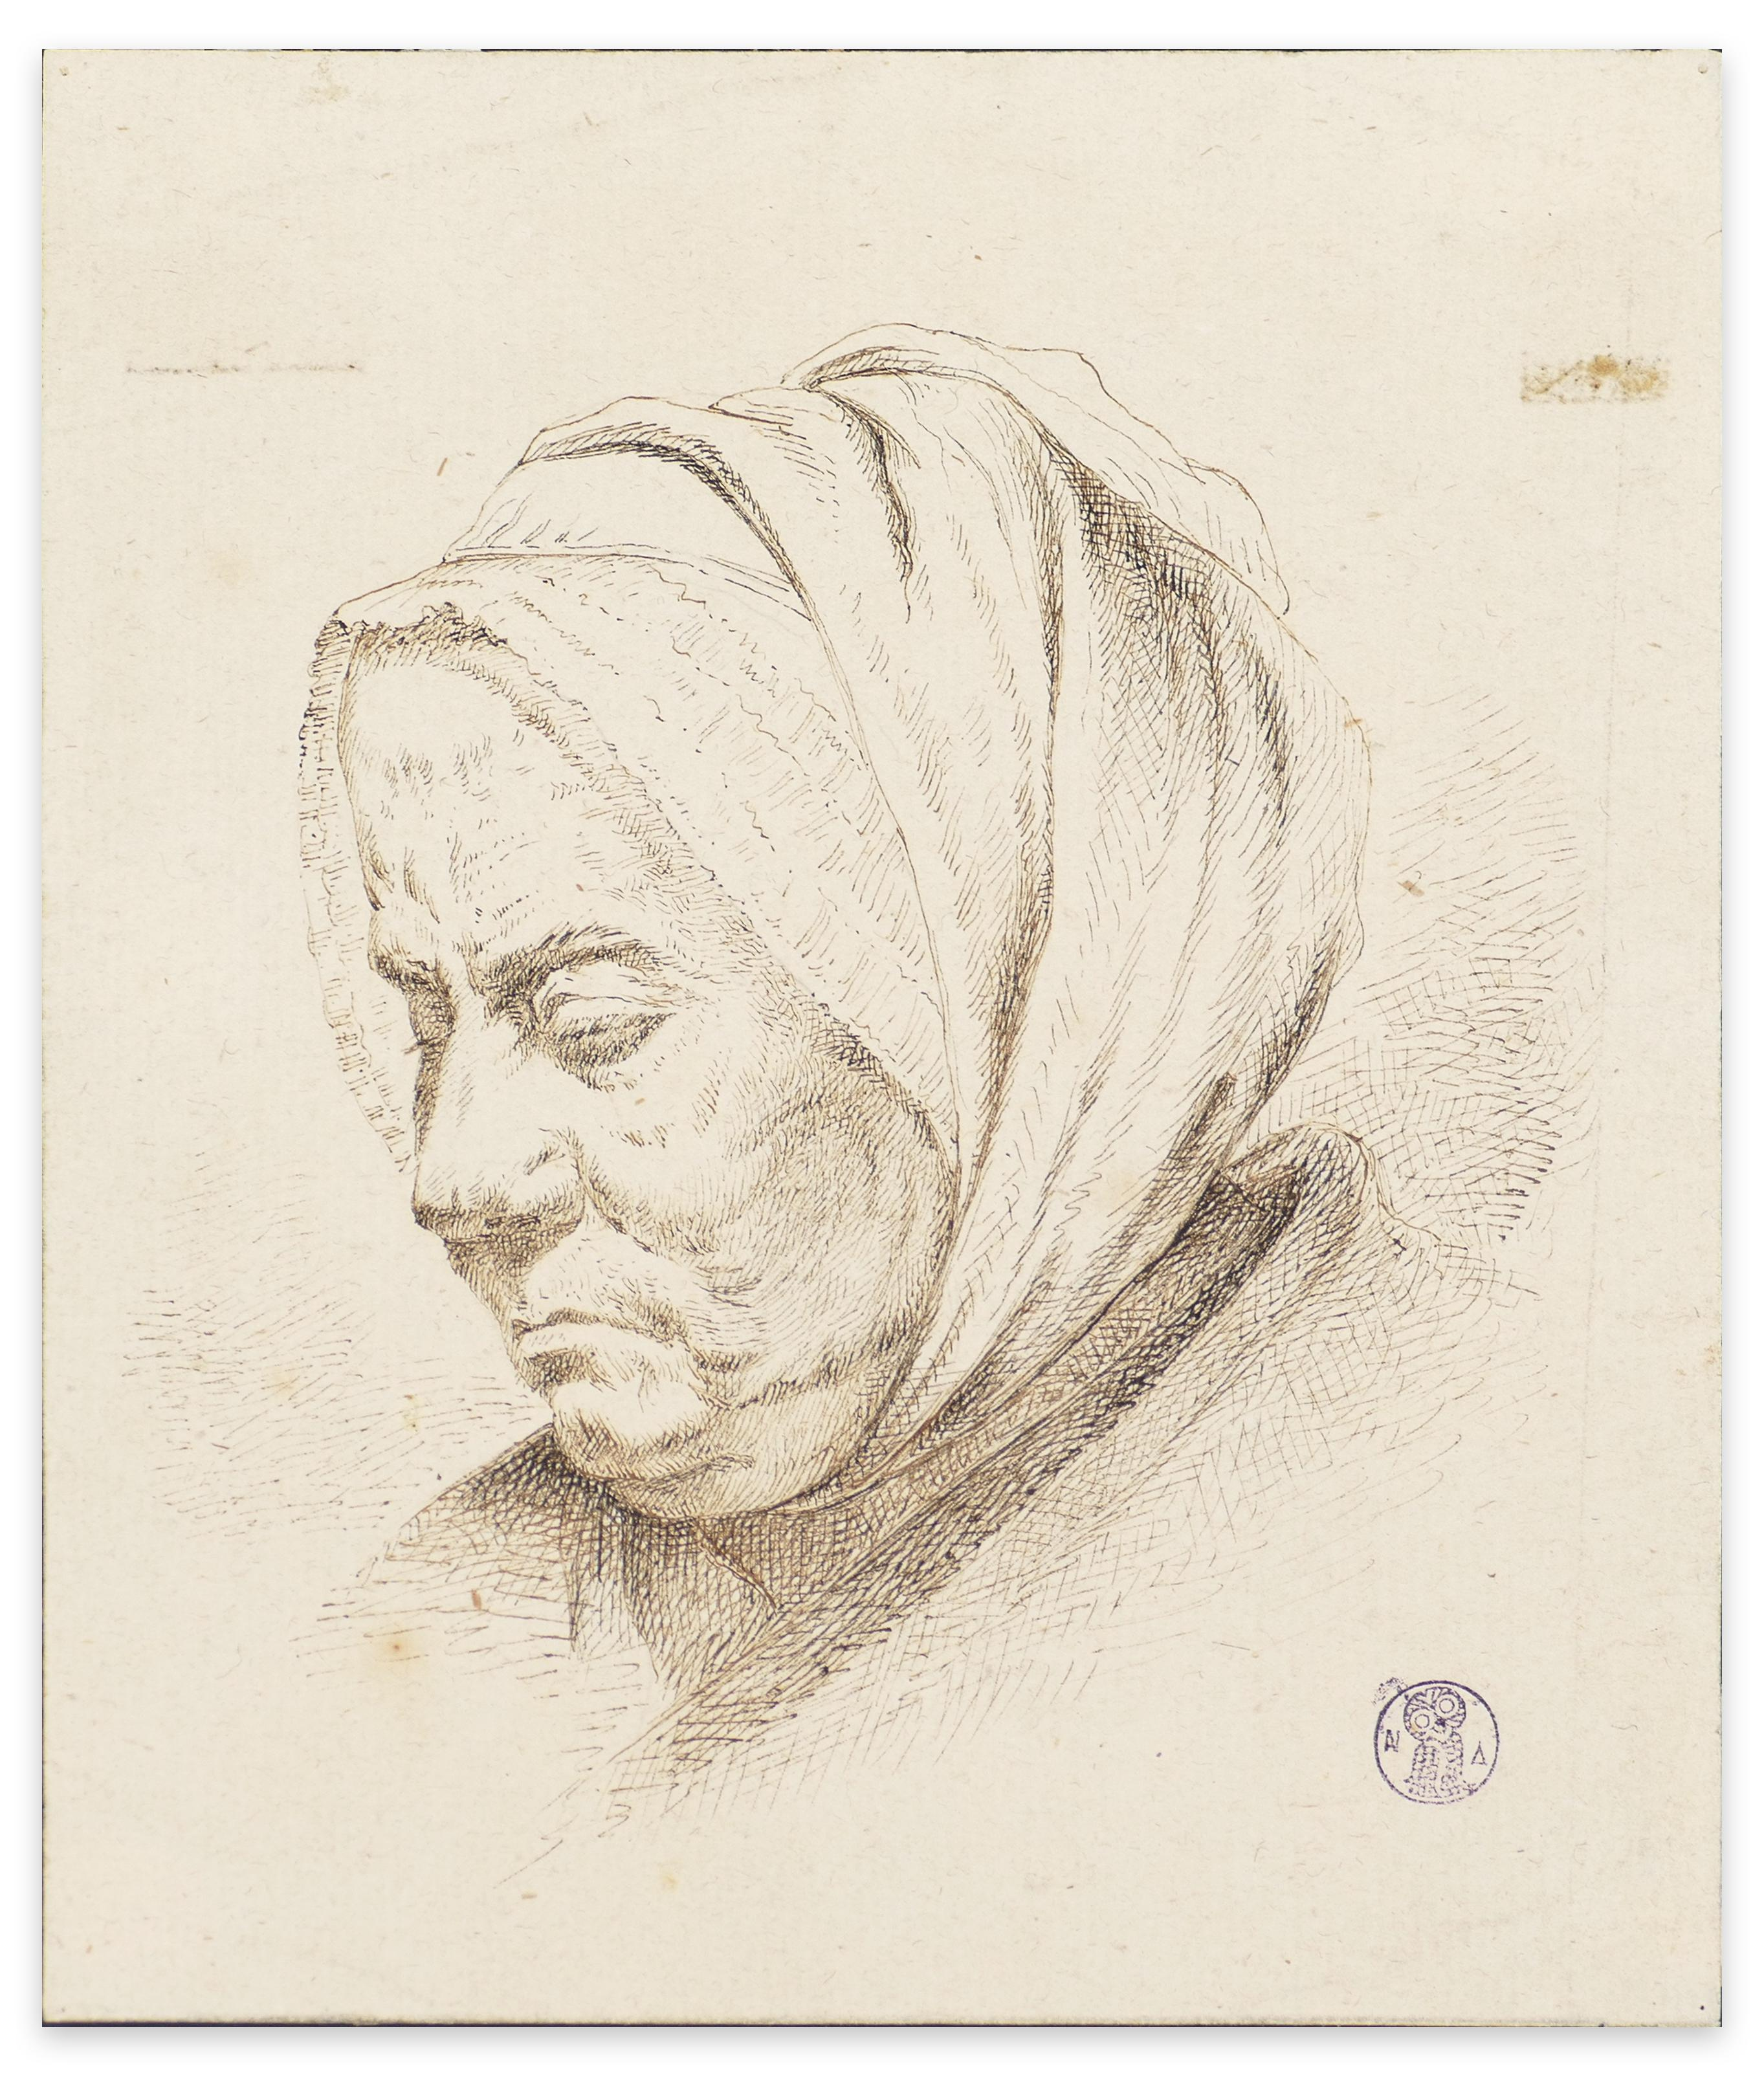 Visage de Femme - Original Etching by I.J. de Caussin - Early 19th Century